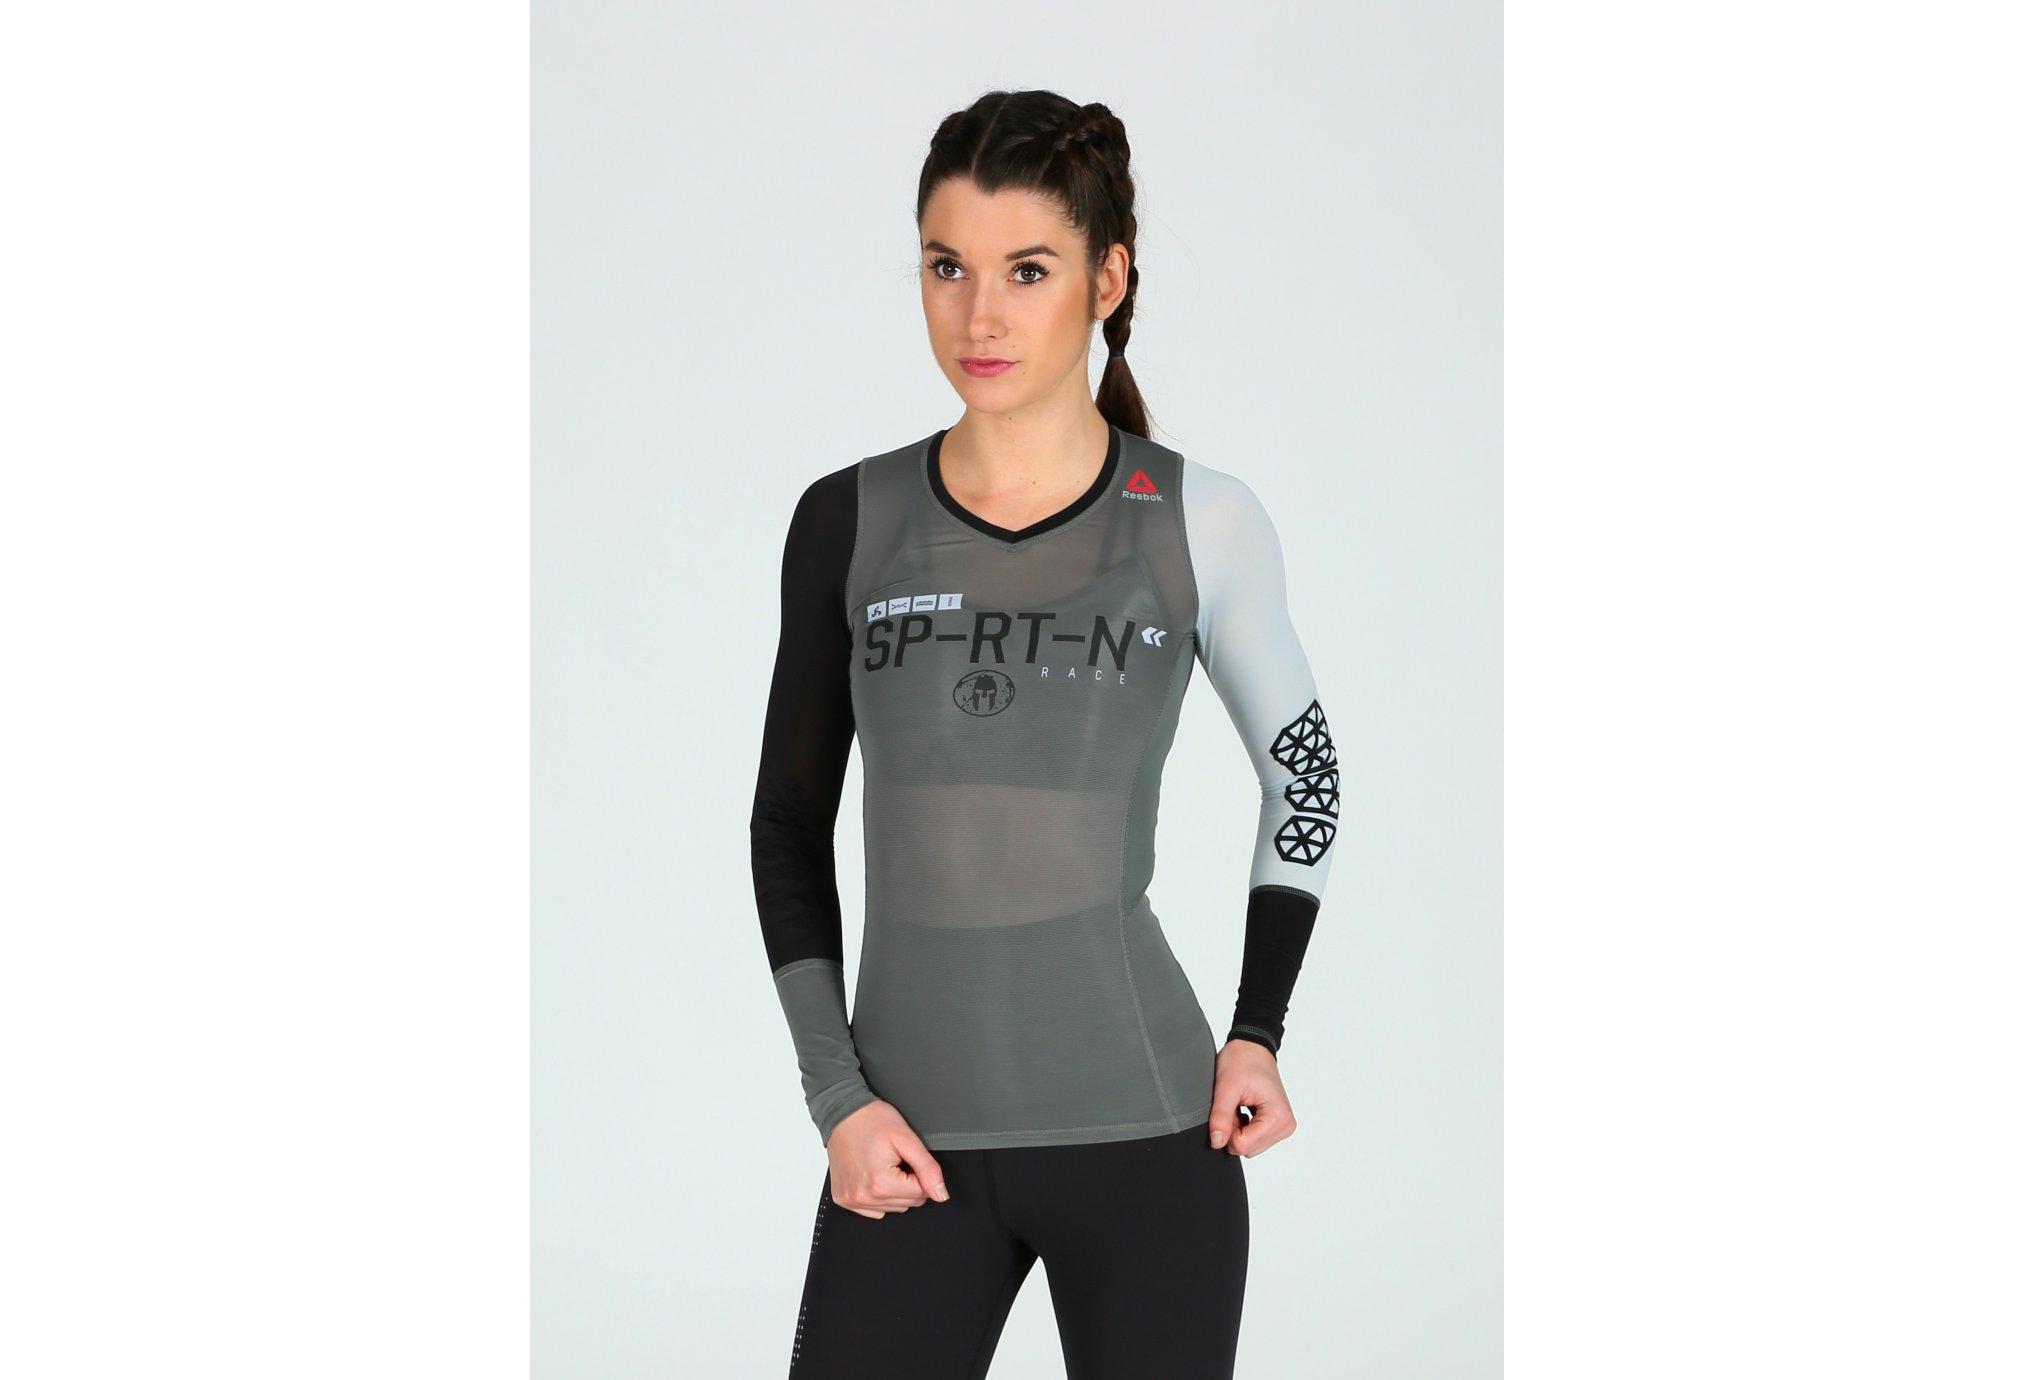 e5a5f744c41b3 Resathlon - Reebok Spartan Compression W vêtement running femme